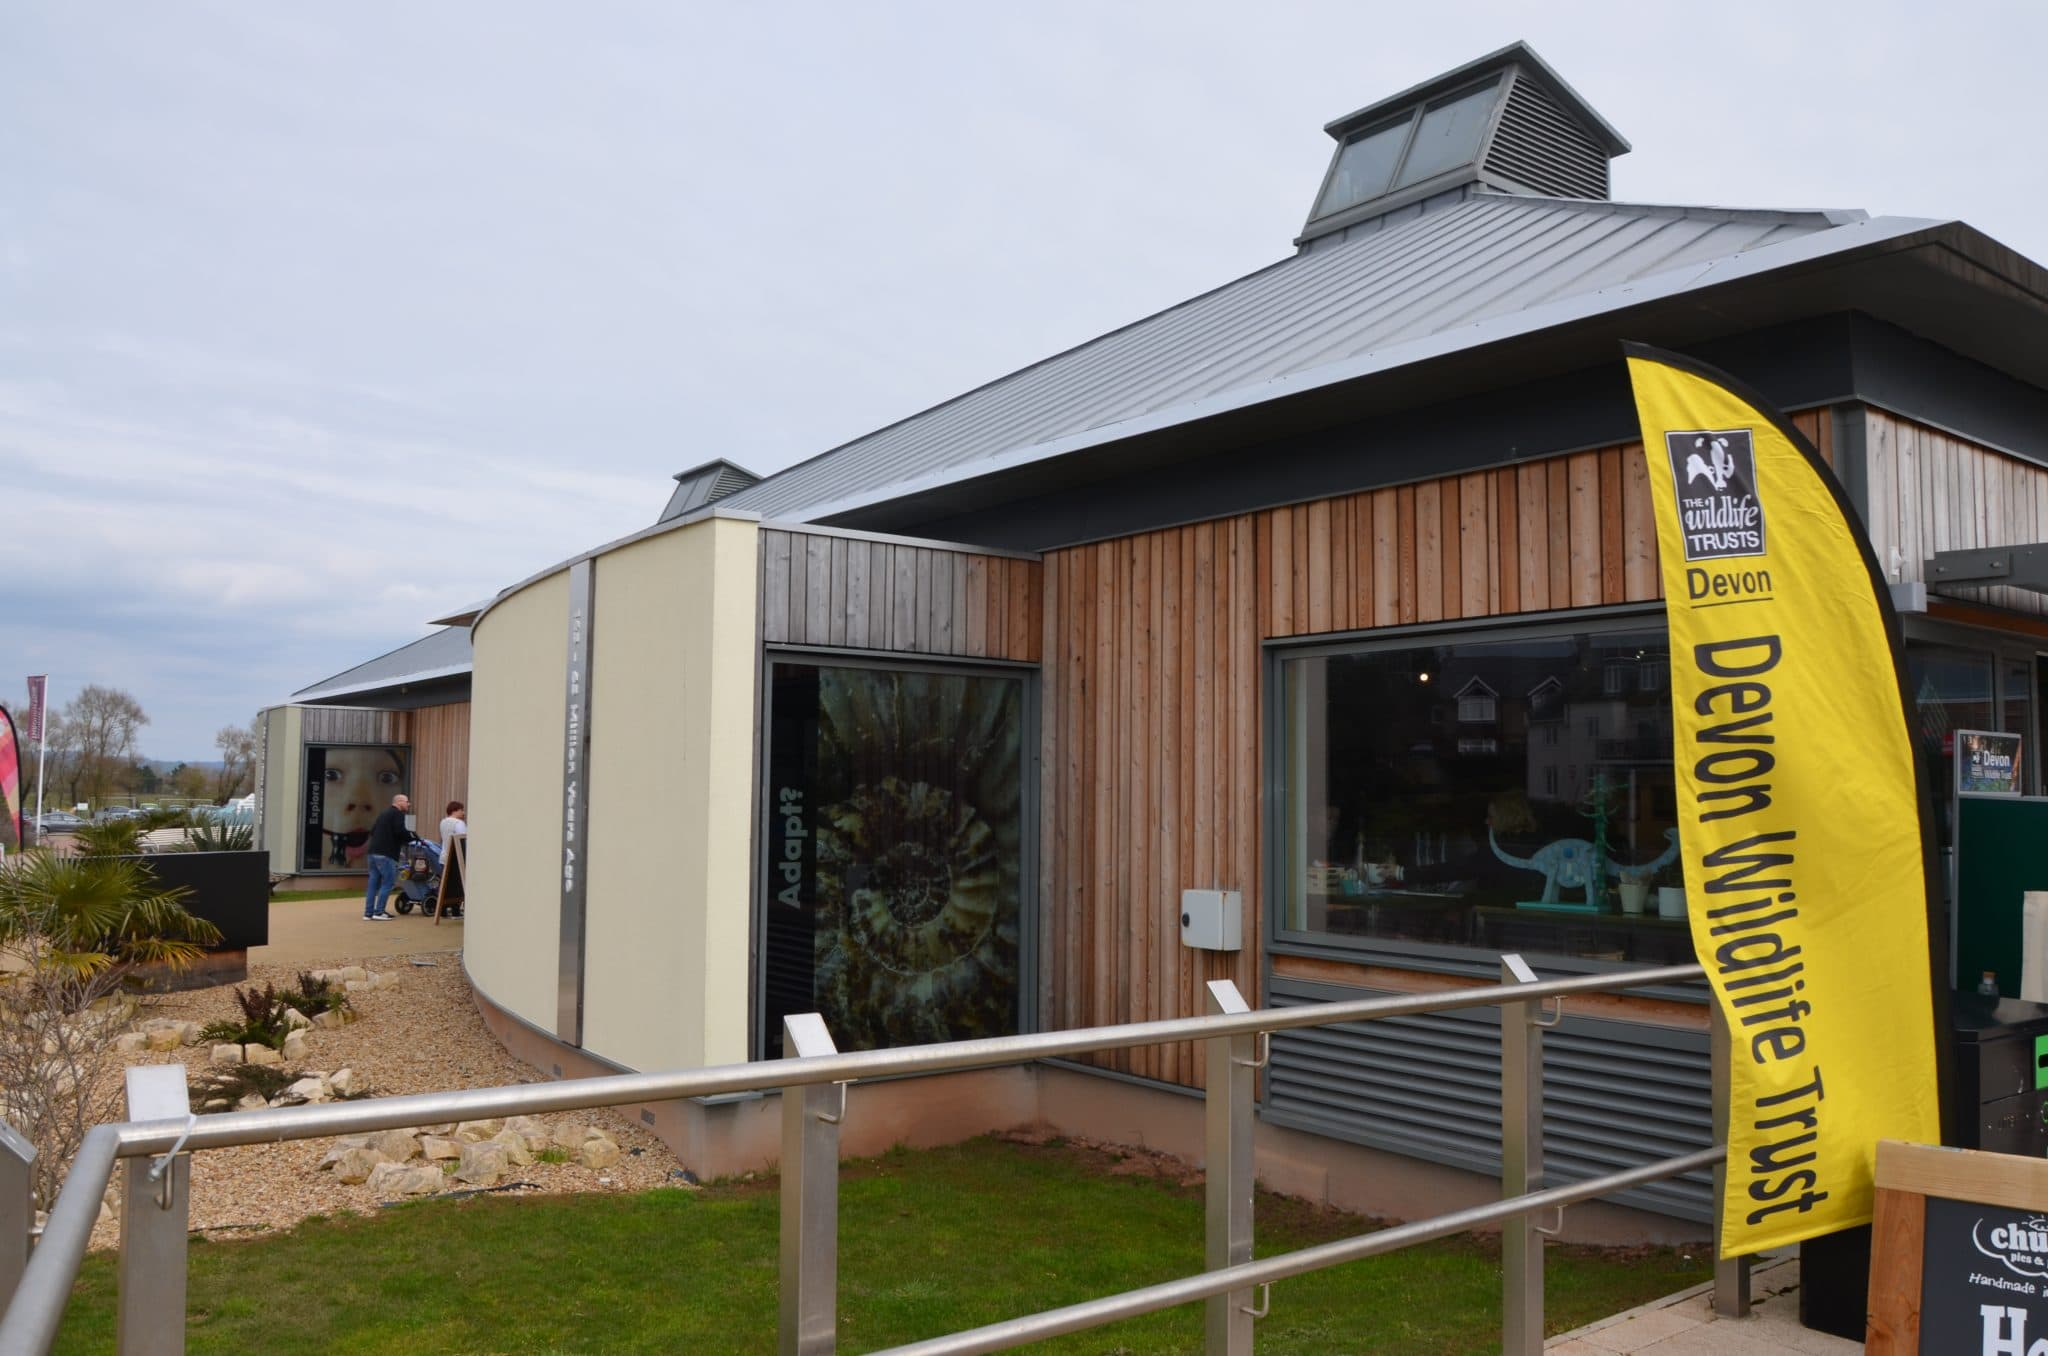 13 - Seaton Jurassic Museum & Visitor Centre